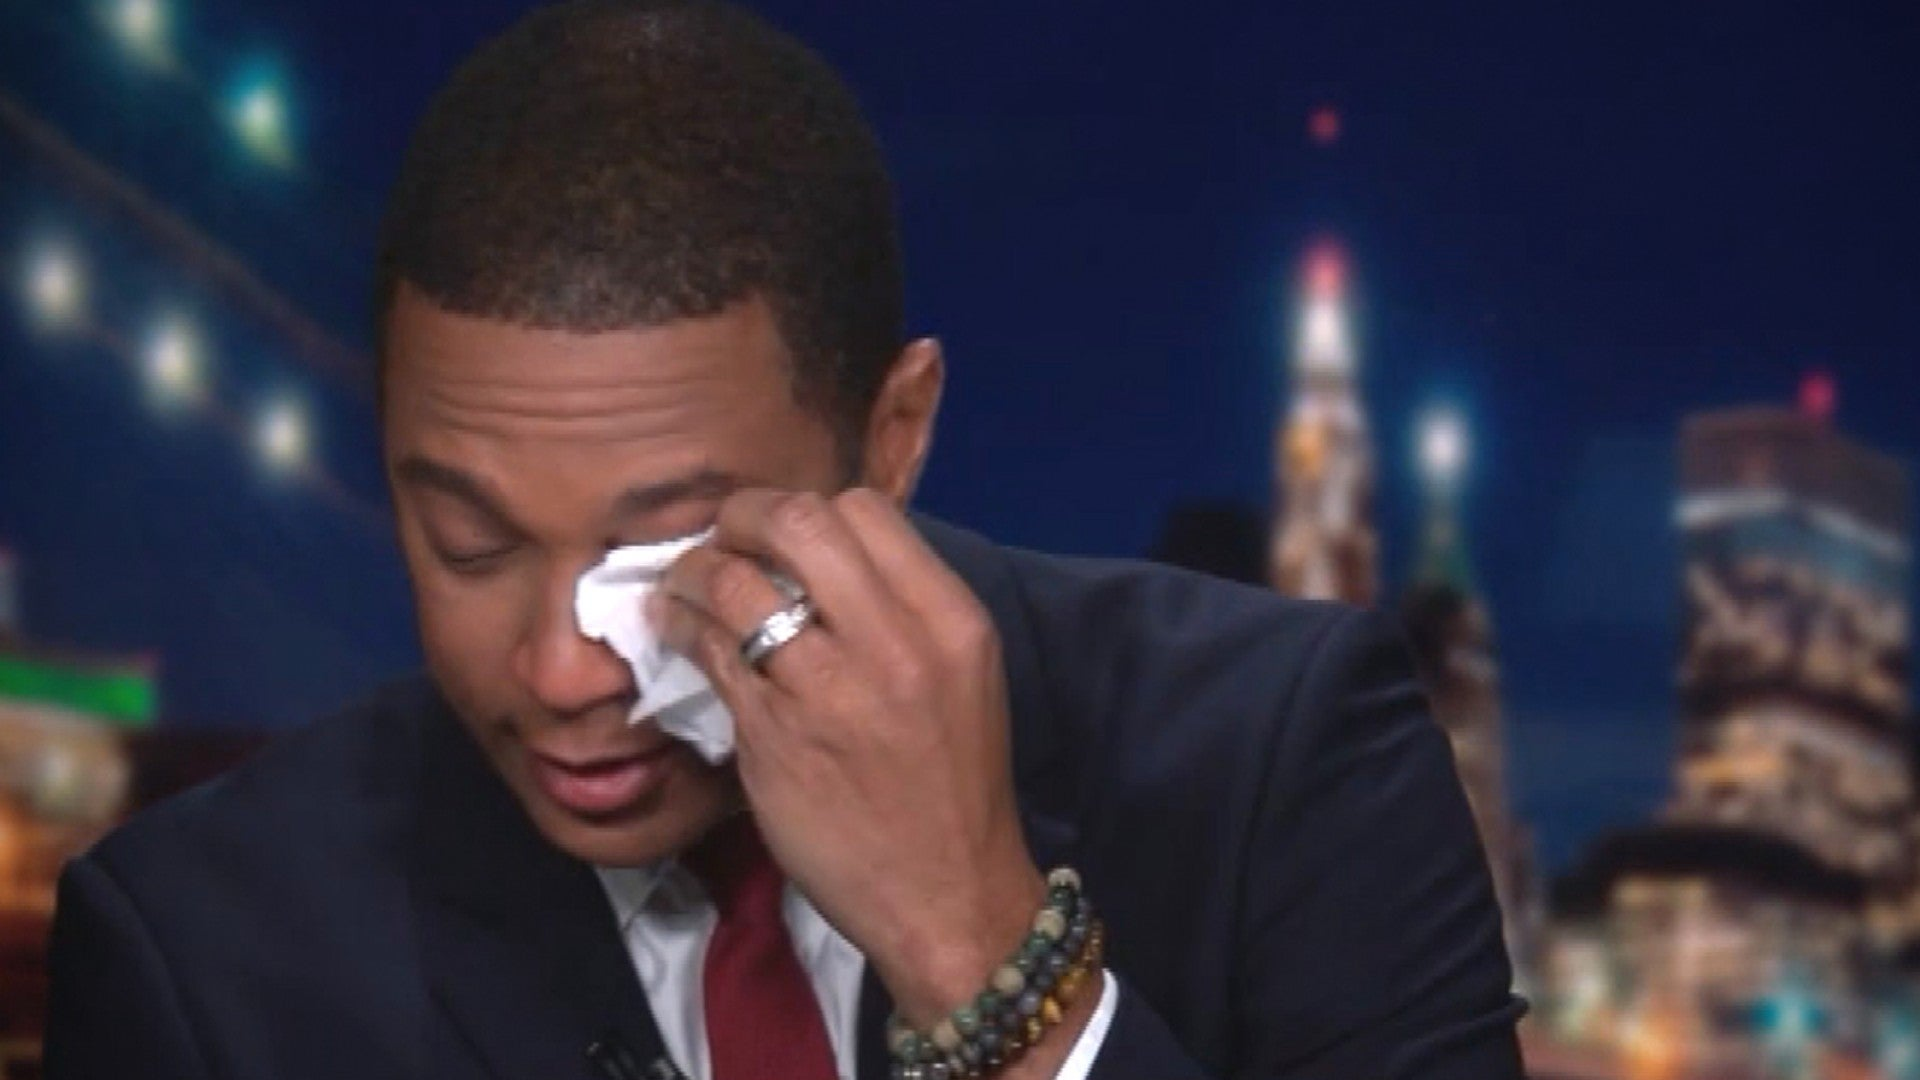 Don Lemon Tears Up Discussing Cnn Anchor Chris Cuomos Coronavirus